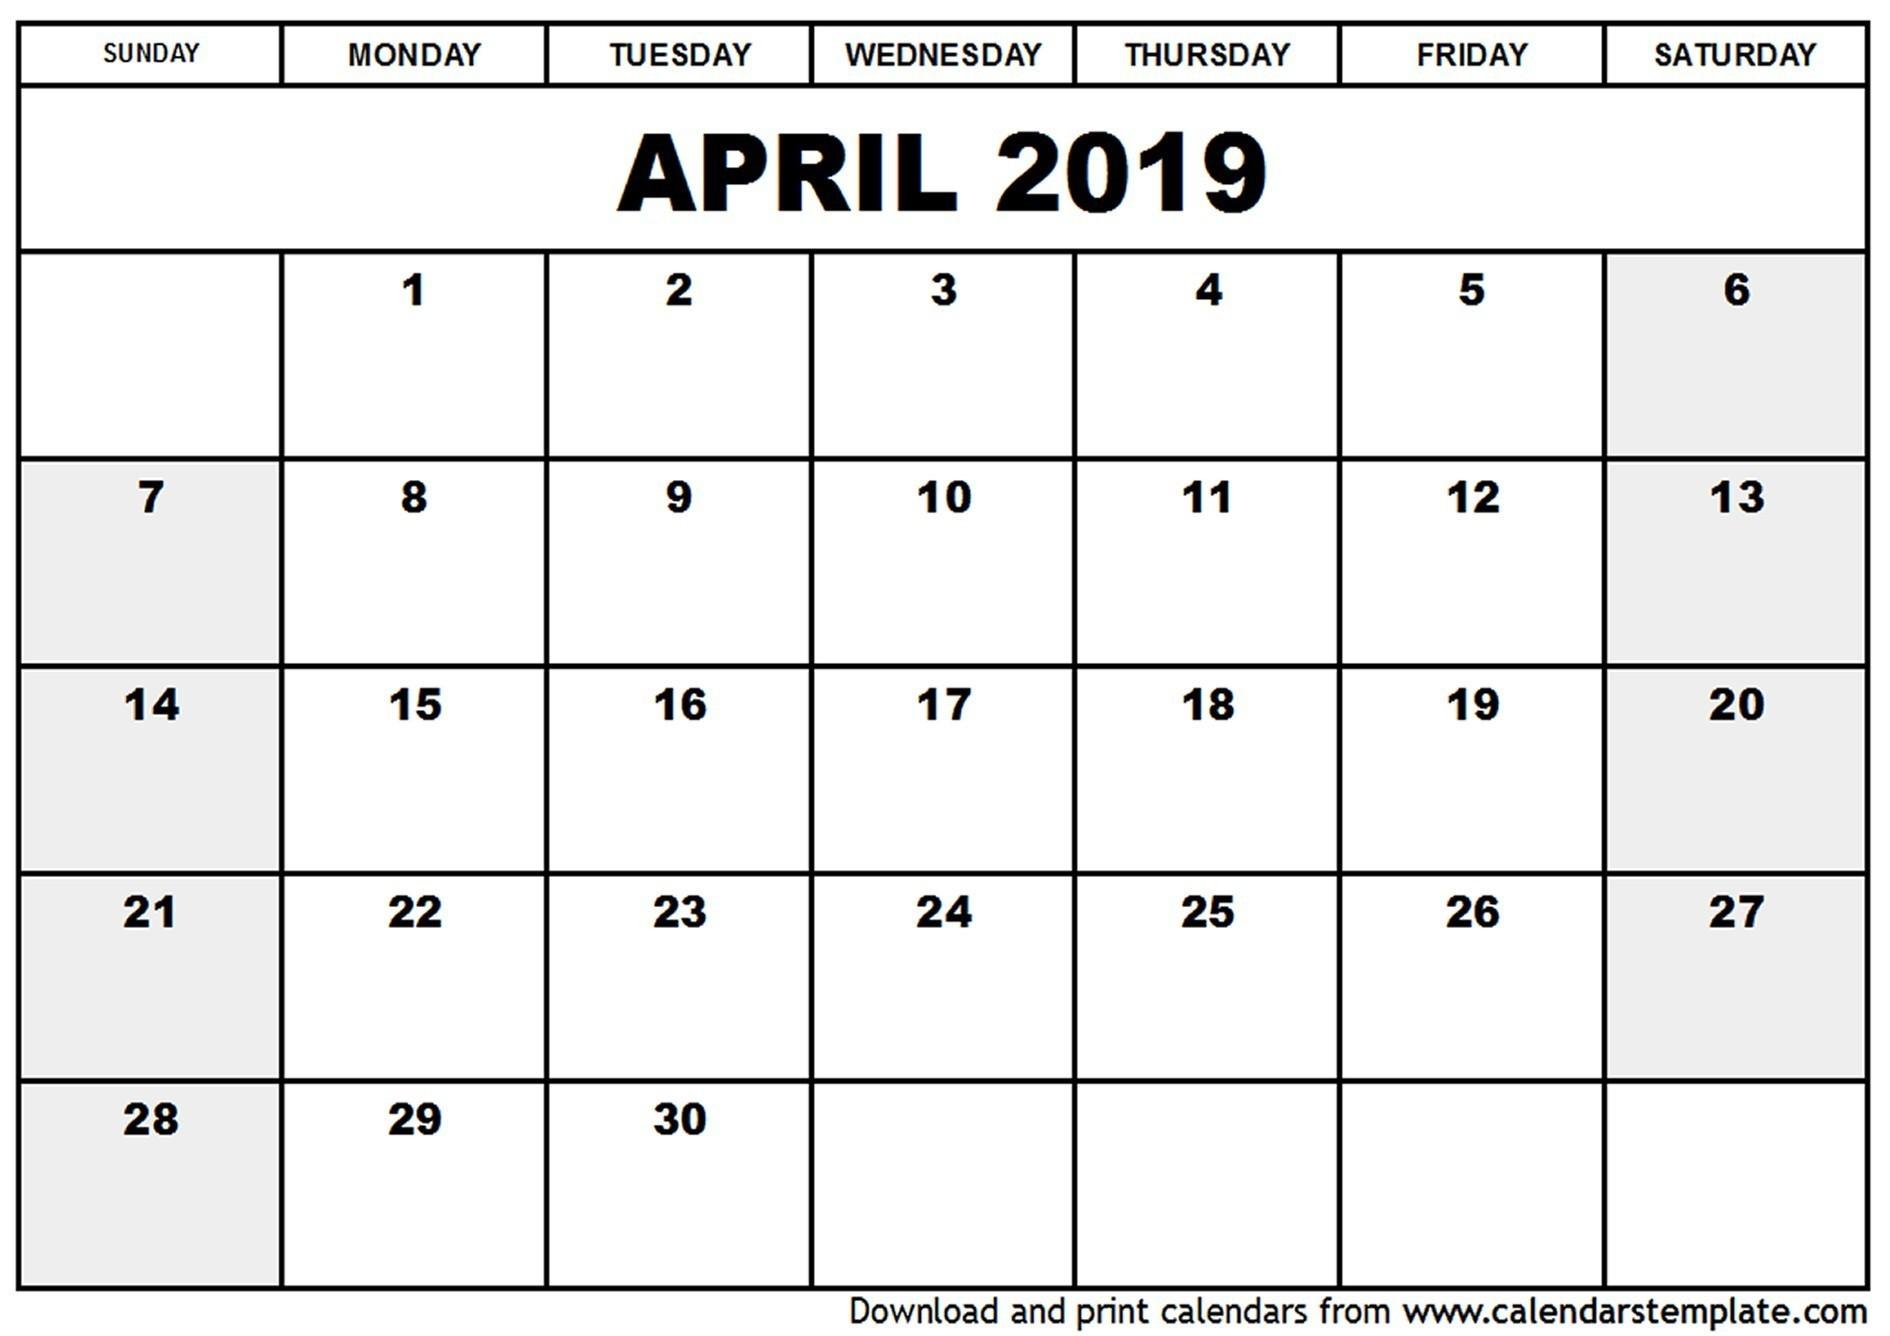 Free Year at A Glance Calendar 2019 Printable Free 2019 Calendar Inspirational Calendar 2019 Blank 2018